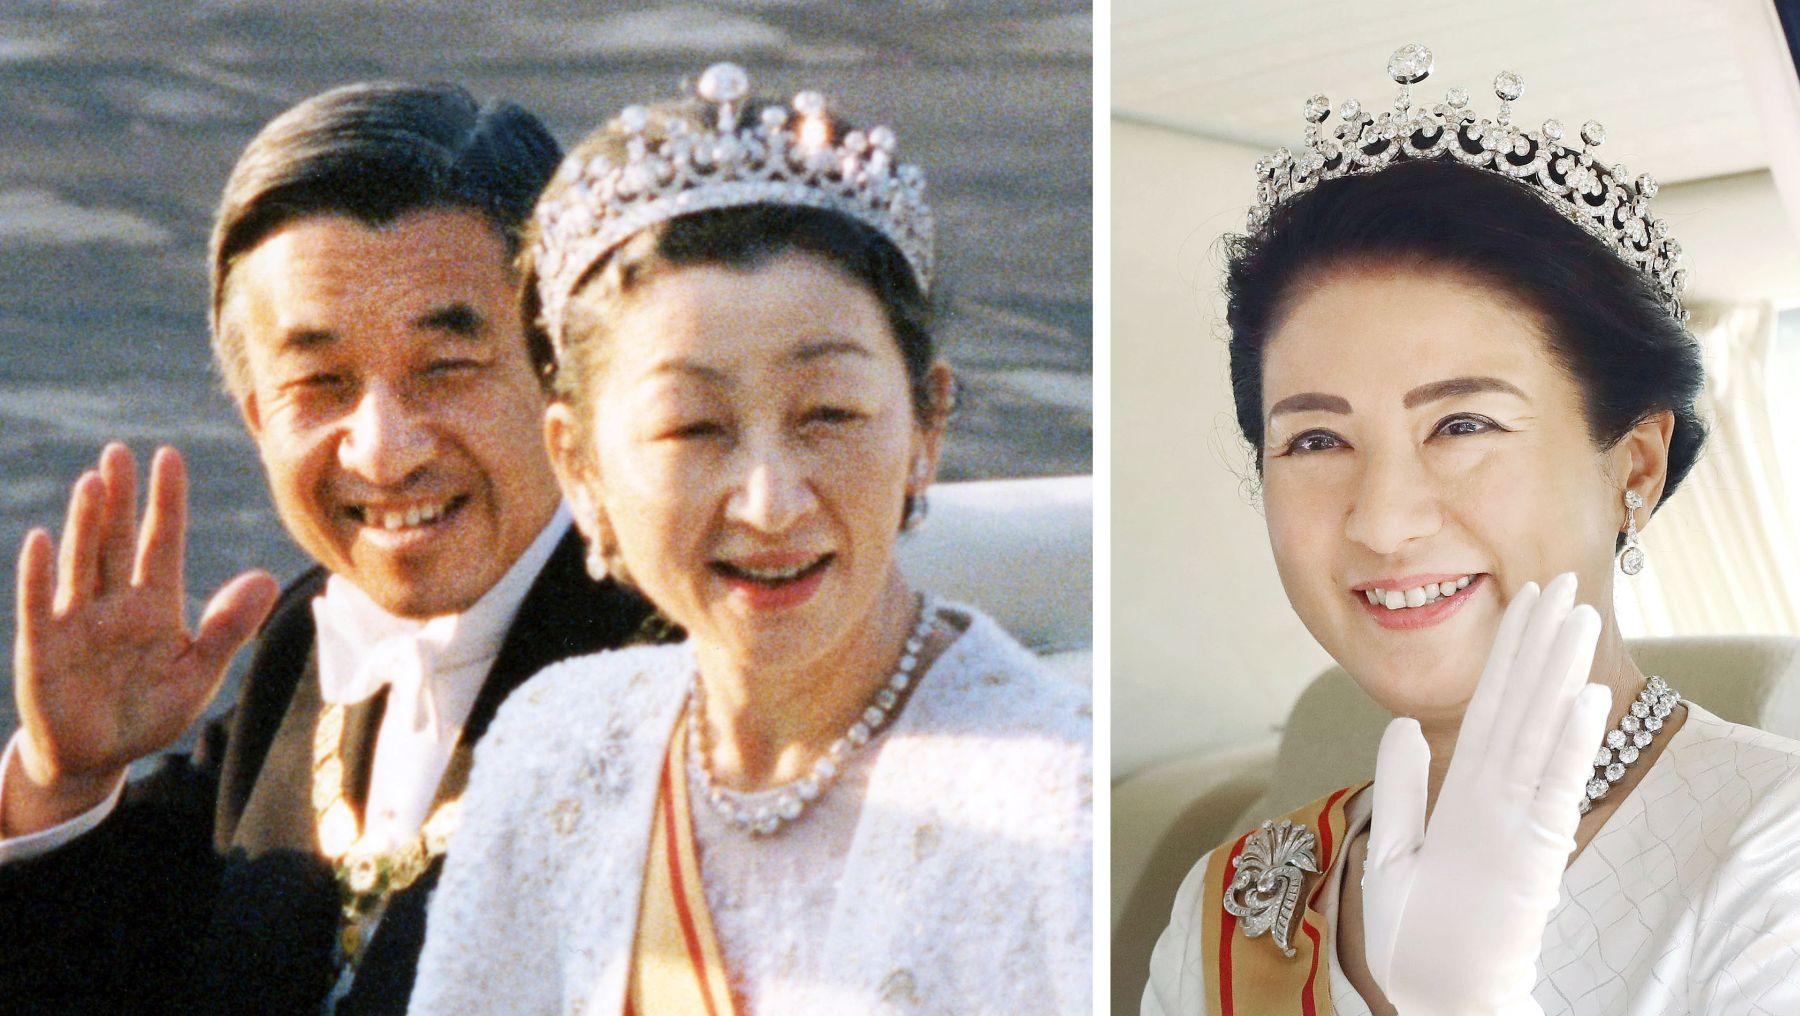 Japan Imperial Trivia Empress Tiara and Dresses 010